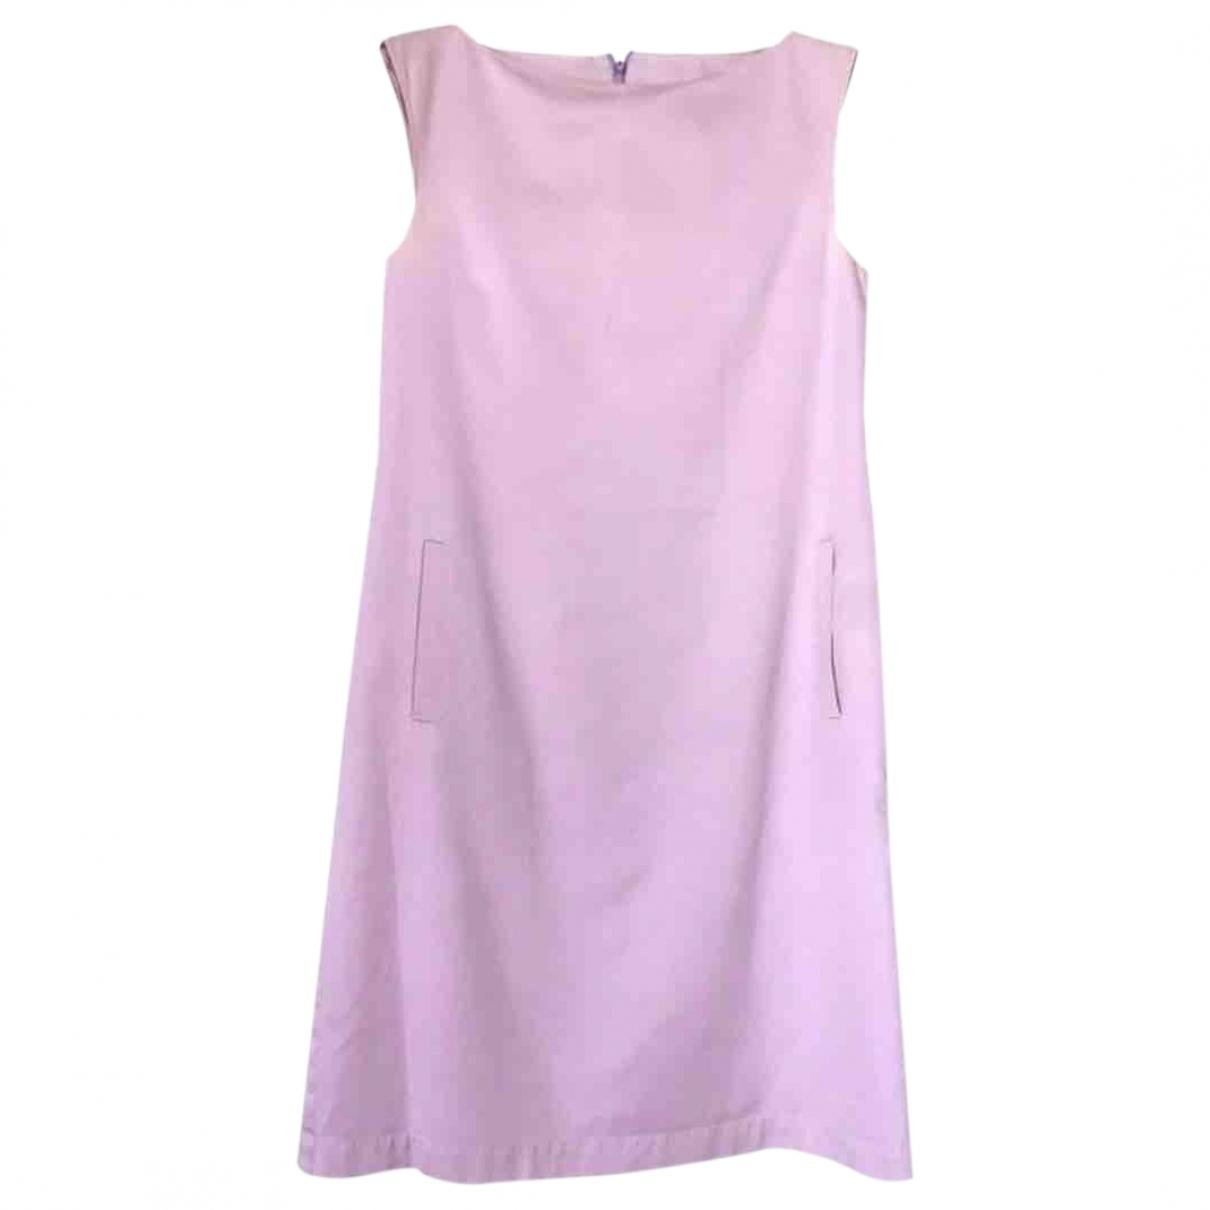 Sport Max \N Cotton dress for Women 40 IT